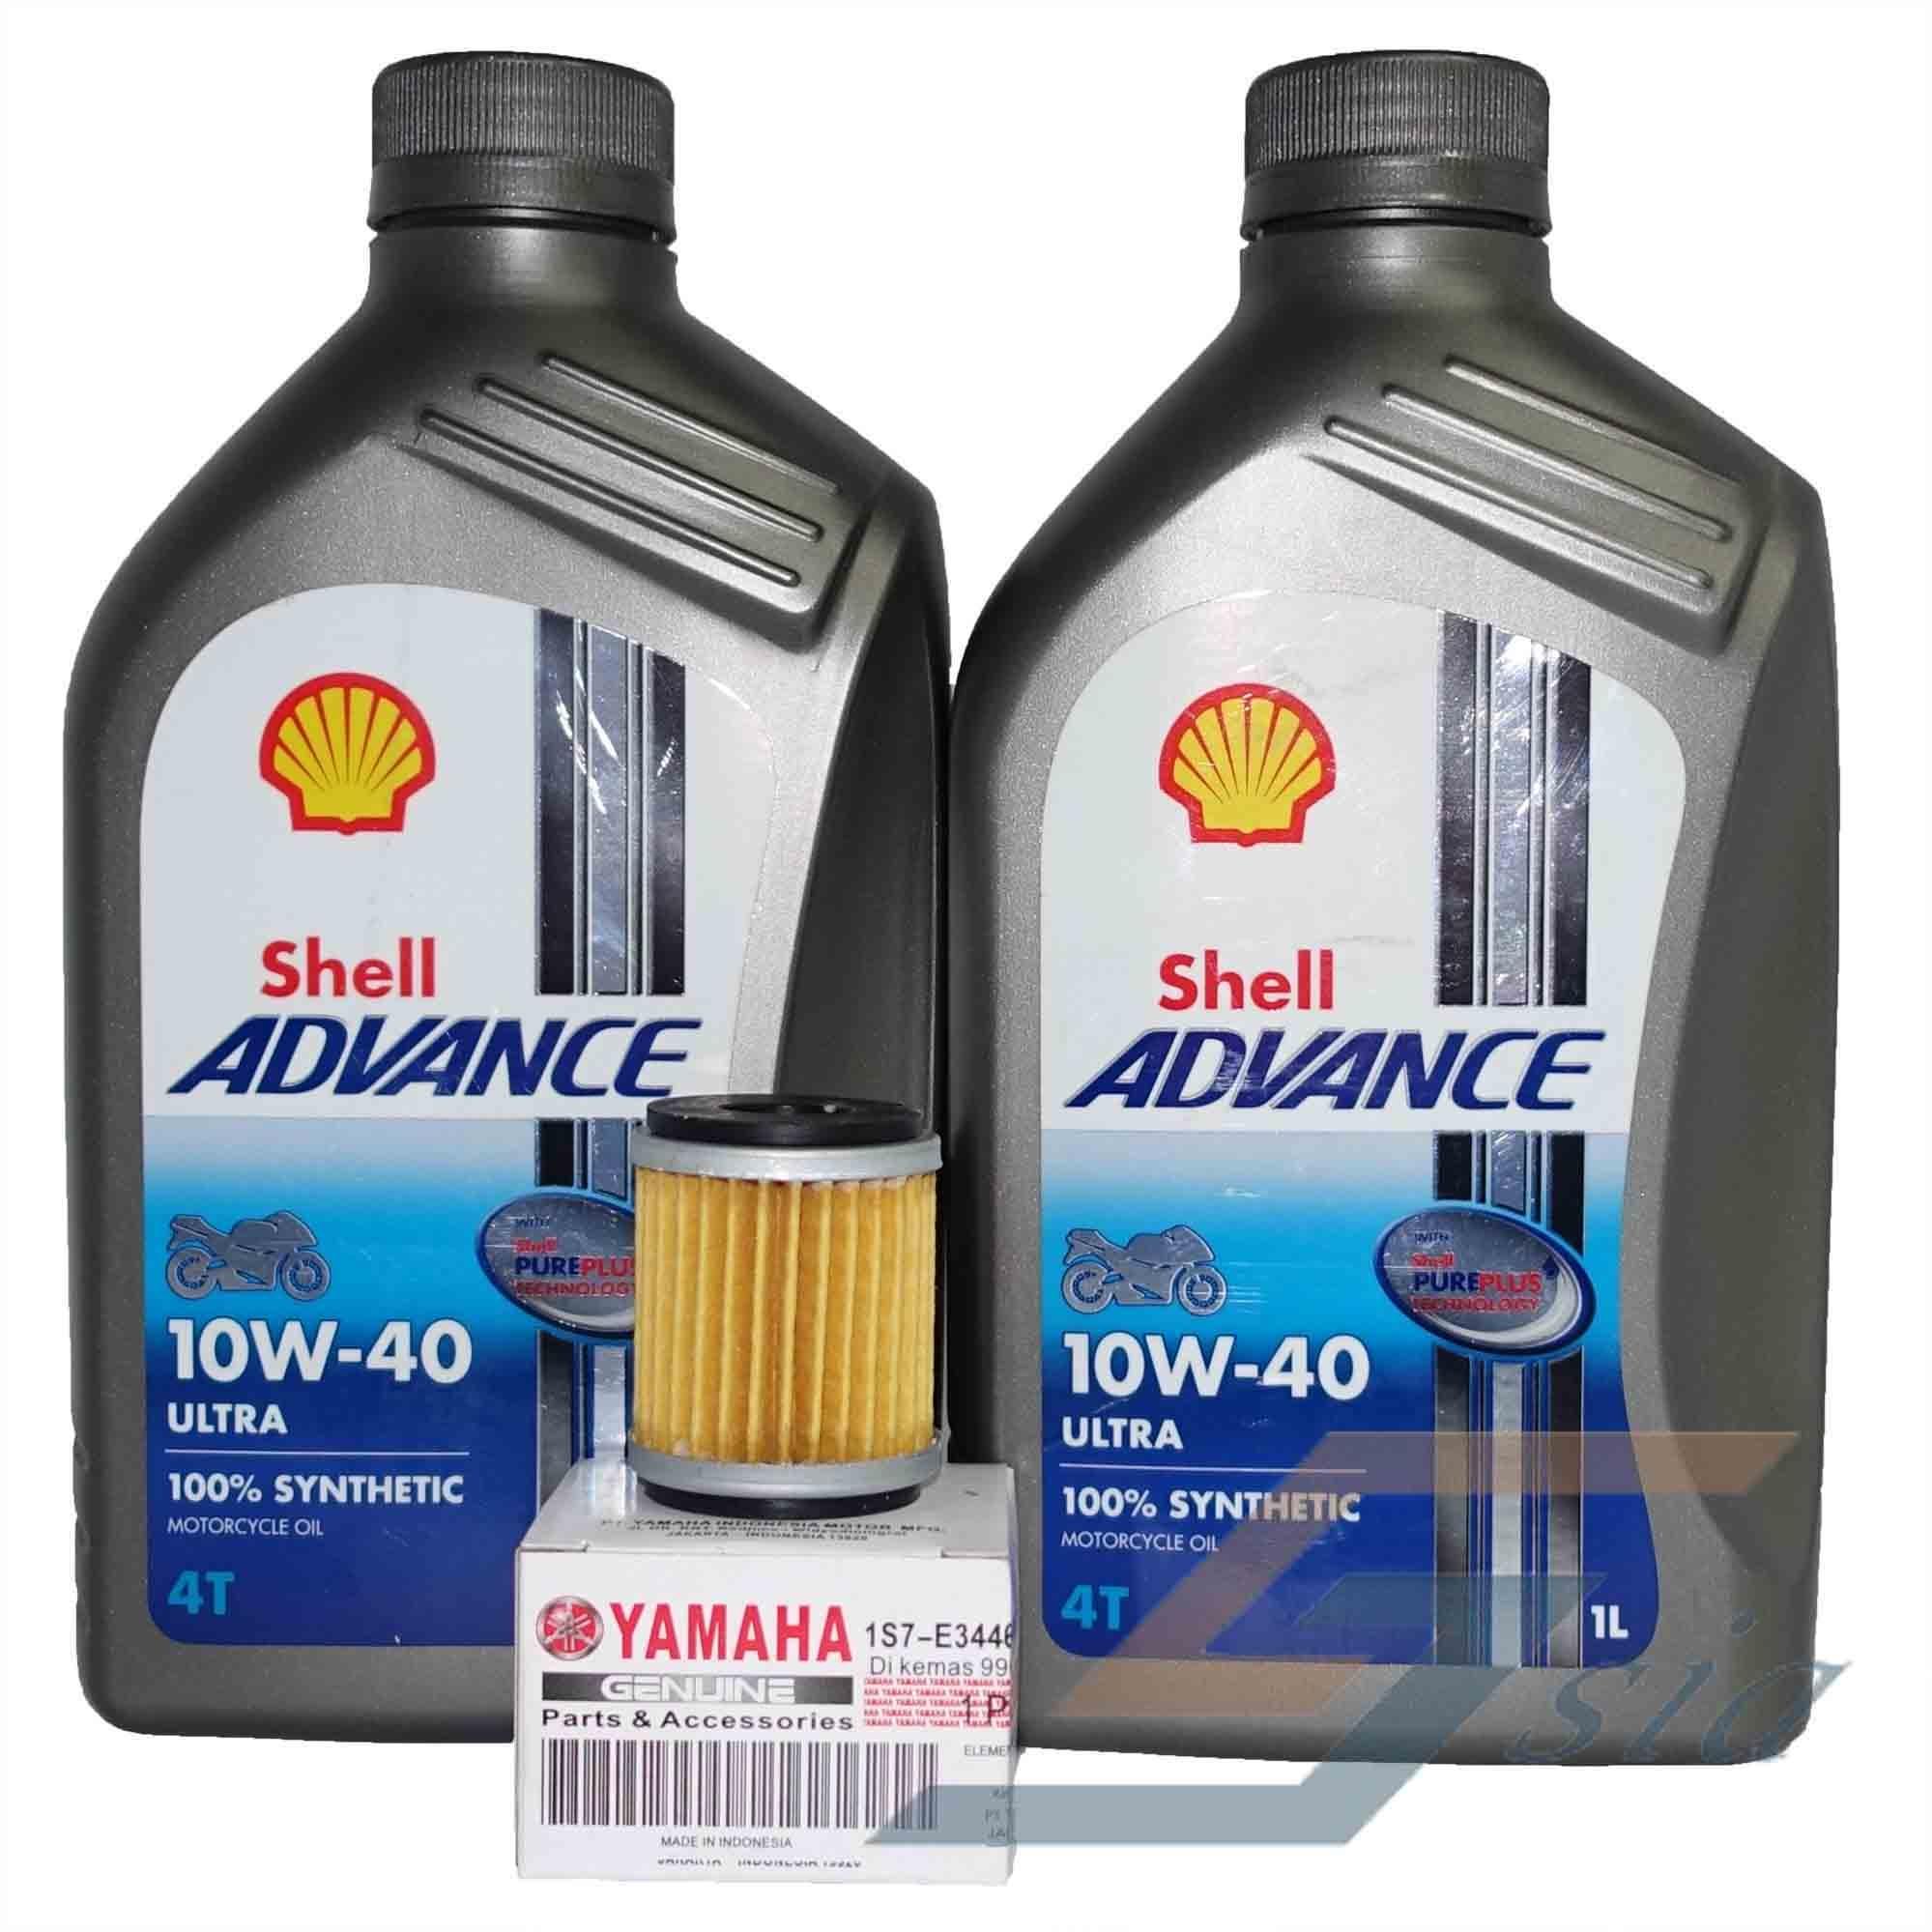 Yamaha Oil Price Harga In Malaysia Lelong Yamalube Sport Motor Shell Advance Ultra 10w 40 Engine 1 Litre X2